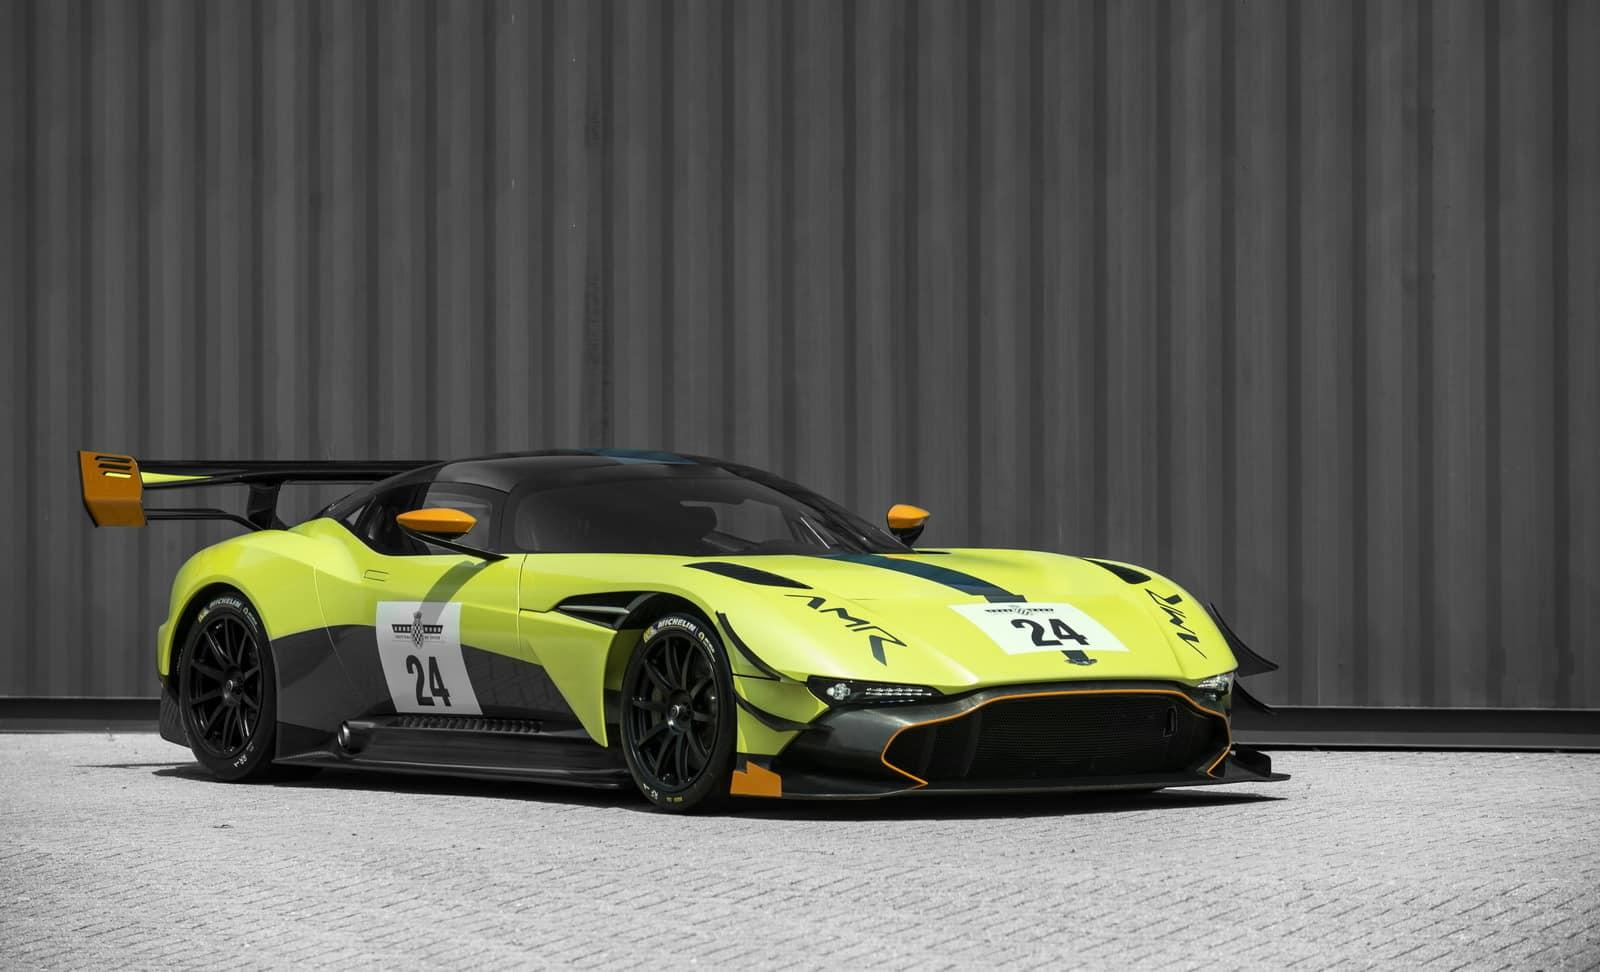 Aston Martin Vulcan AMR PRO 5